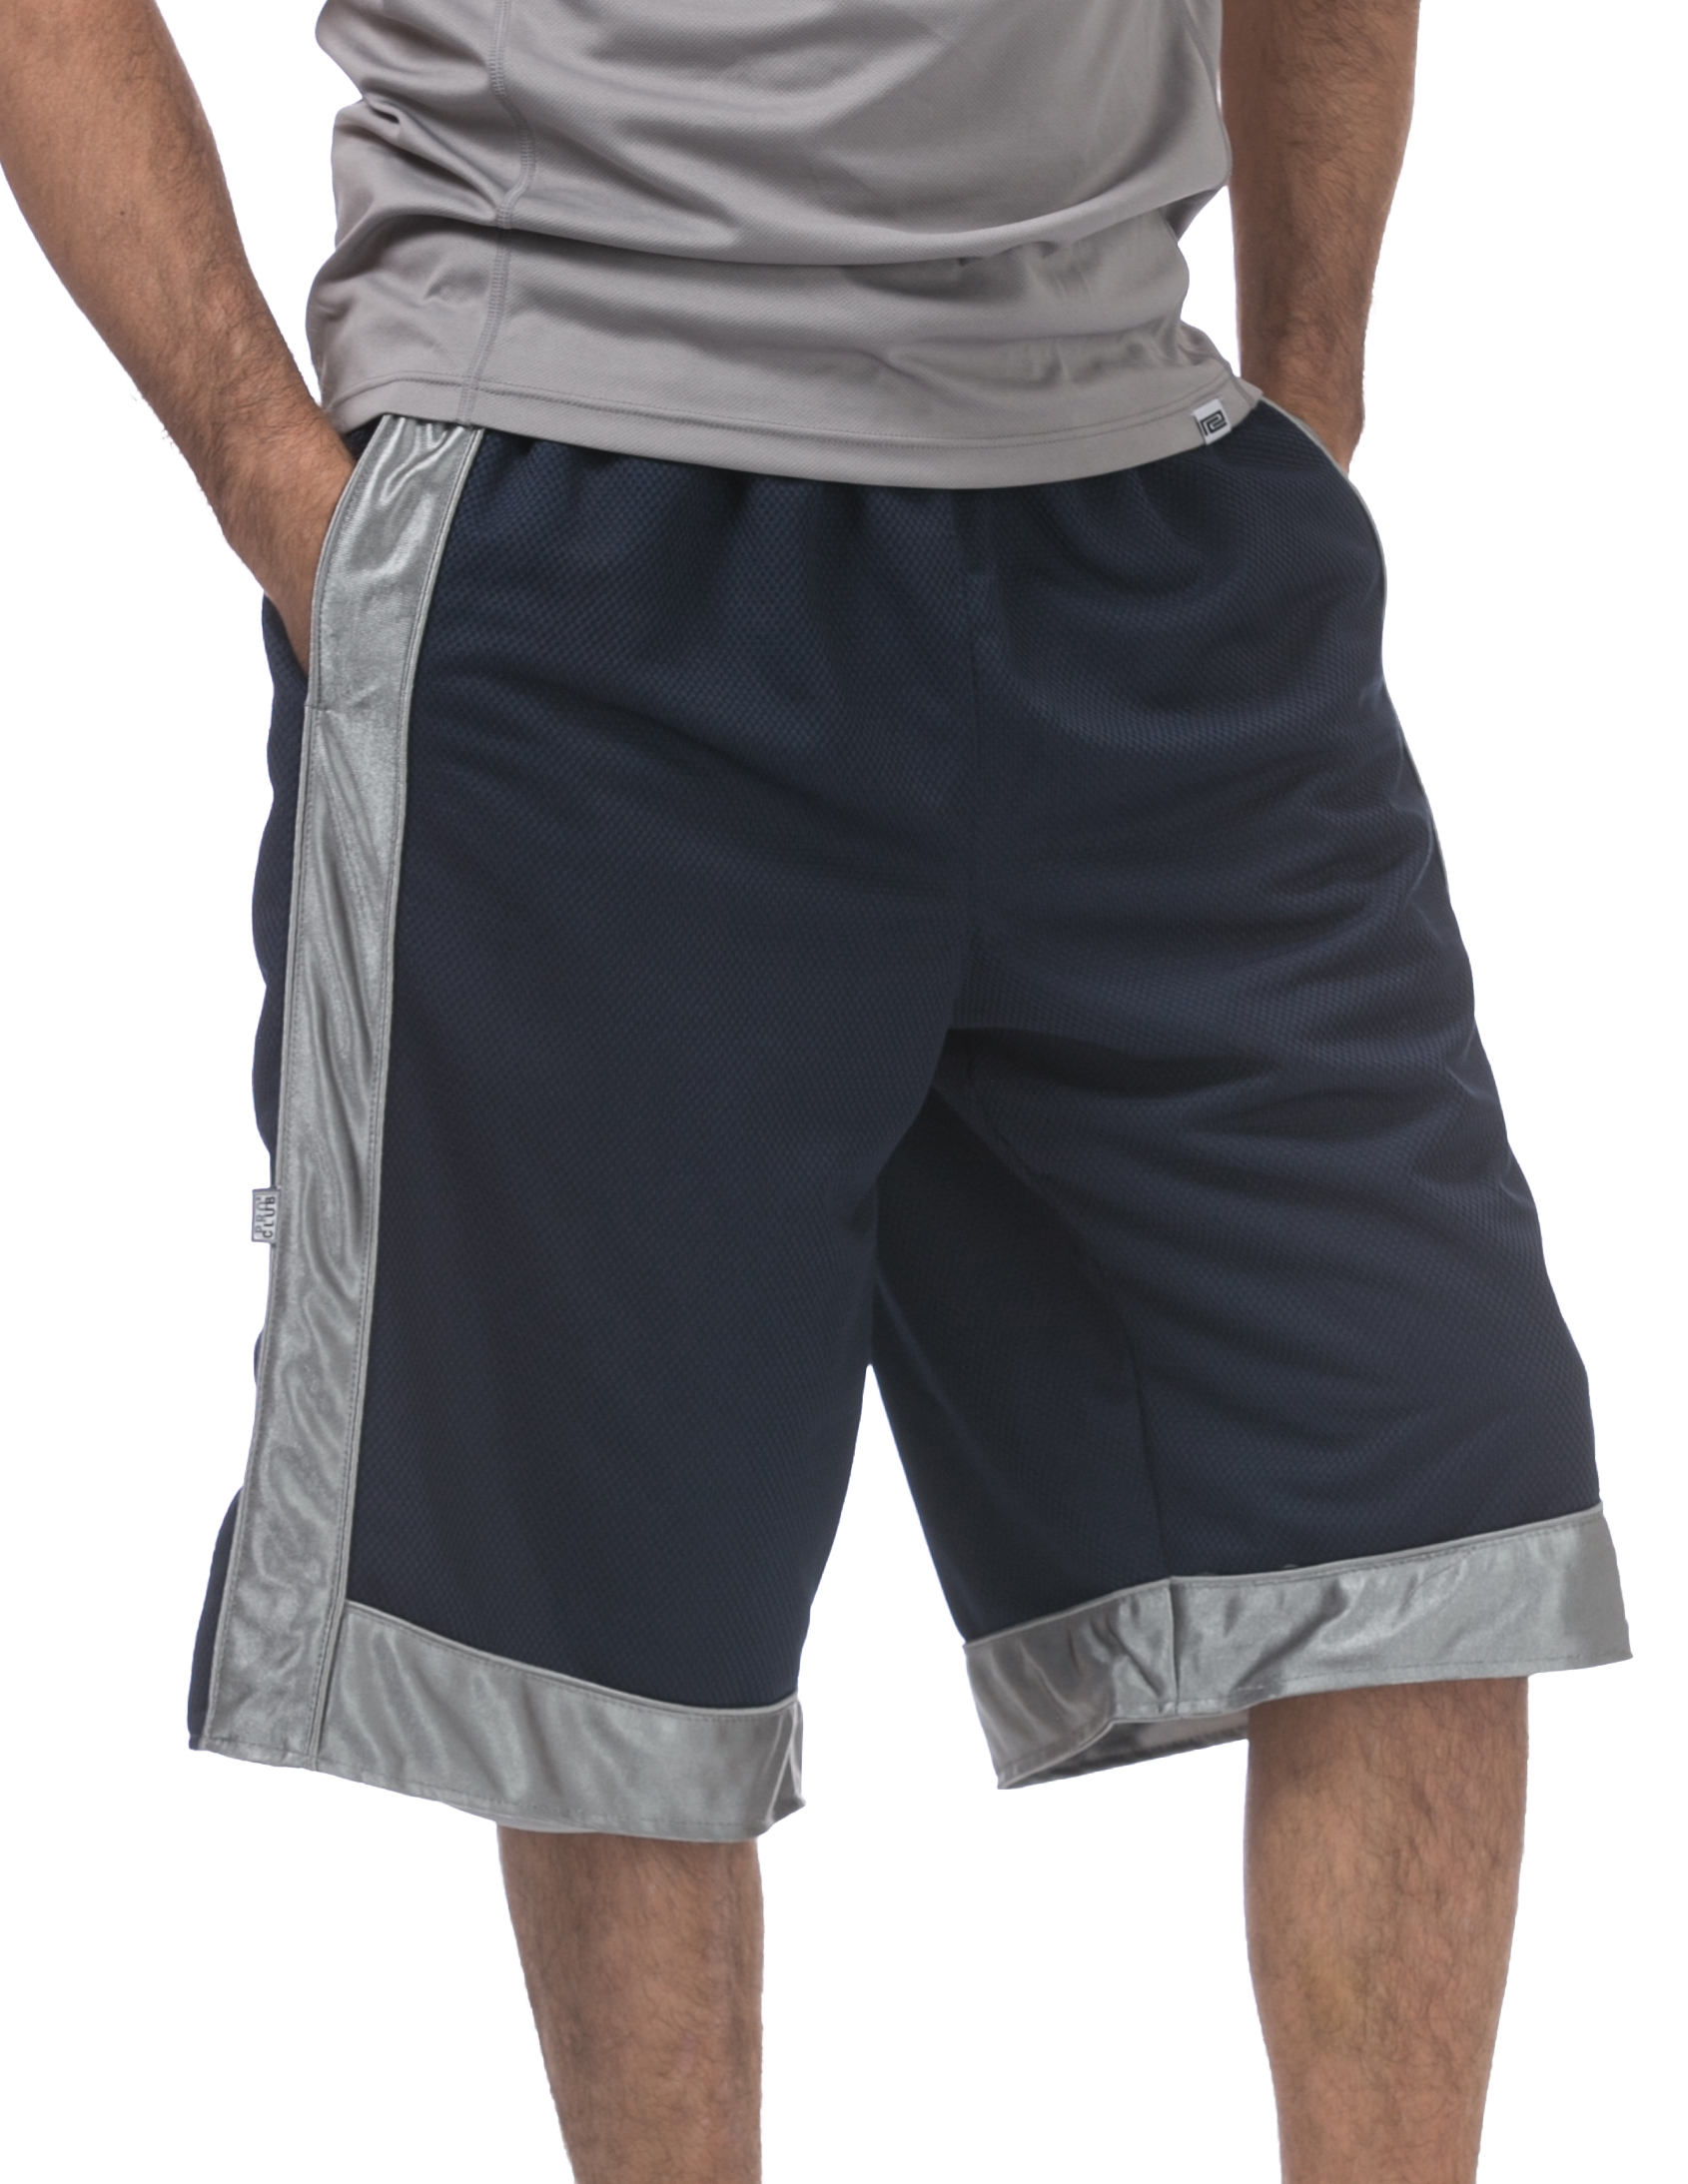 Navy Blue White gym shorts Heavy weight basketball football soccer shorts S-4X